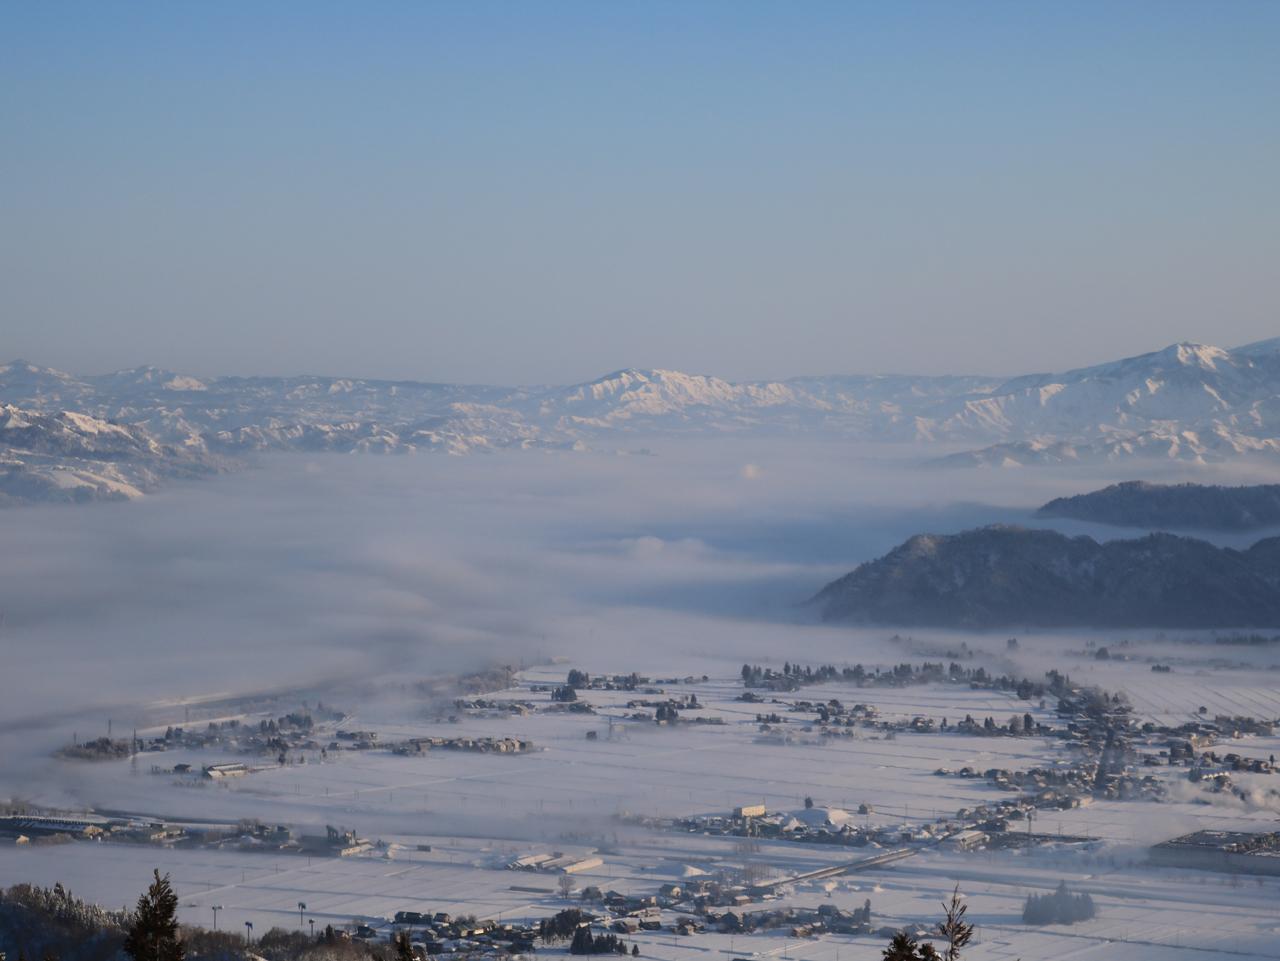 2018.3.3 sat. 冬の坂戸山・早起きのすゝめ BY HUNTER-SHISHIMAI